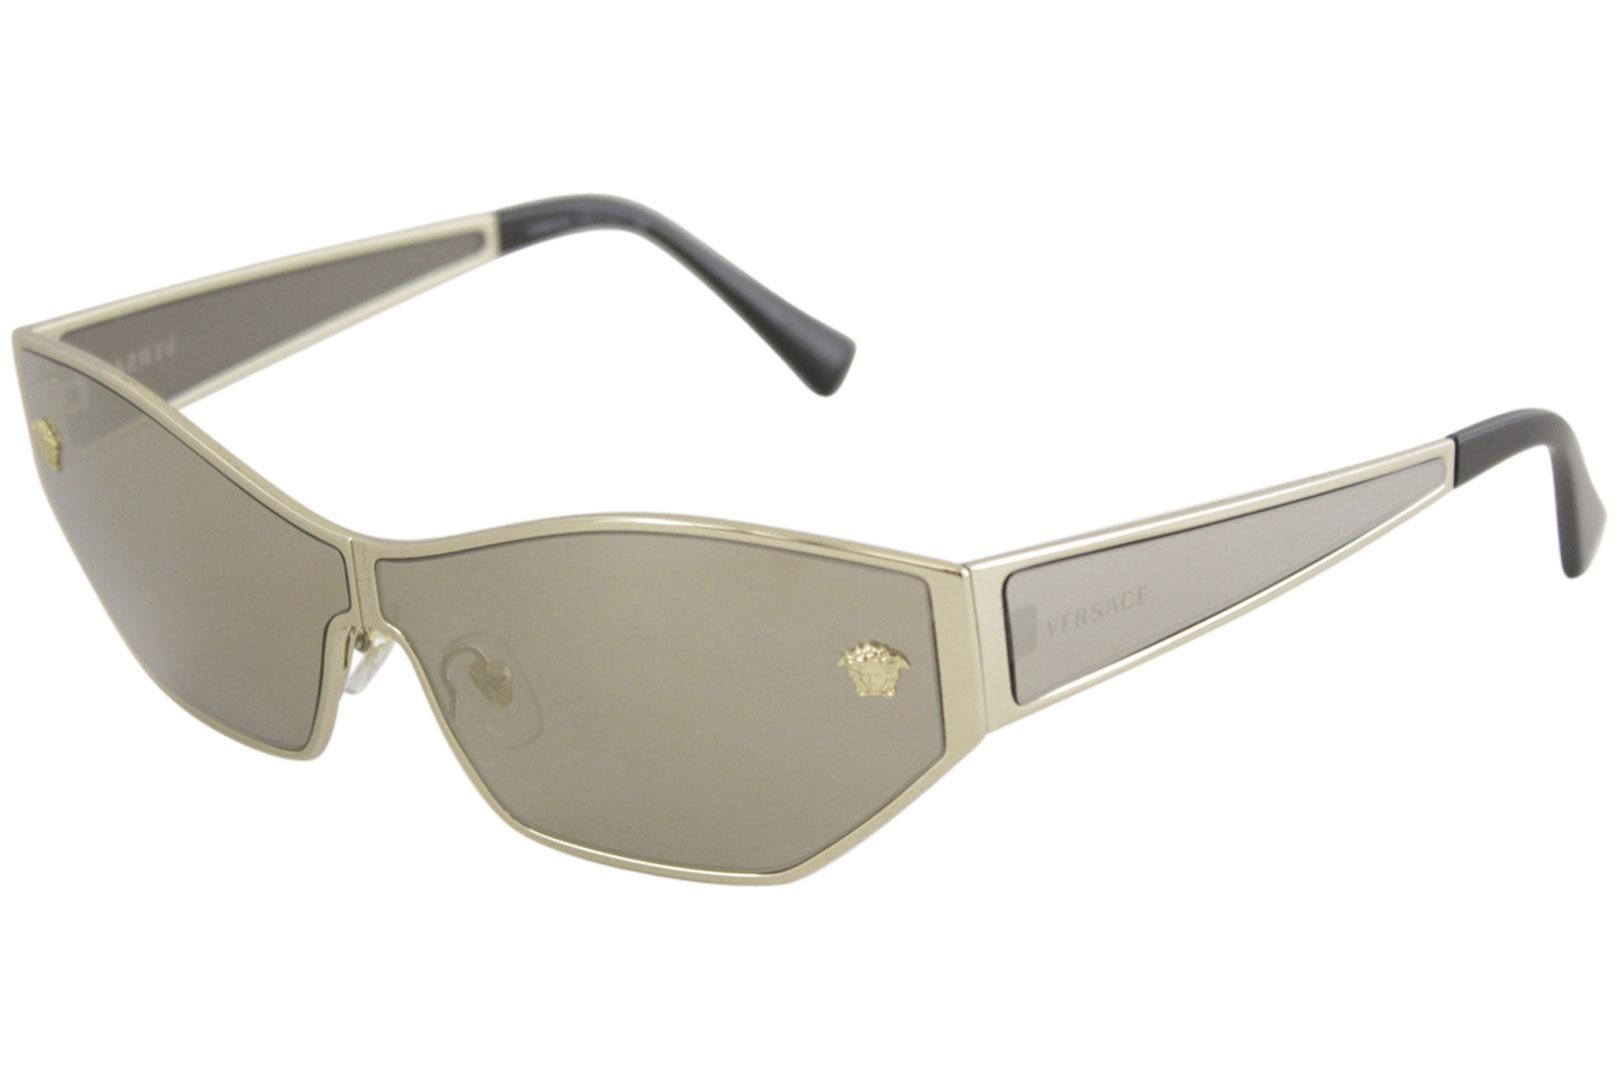 67c1ed49d43 Versace Women s VE2205 VE 2205 Fashion Cat Eye Sunglasses